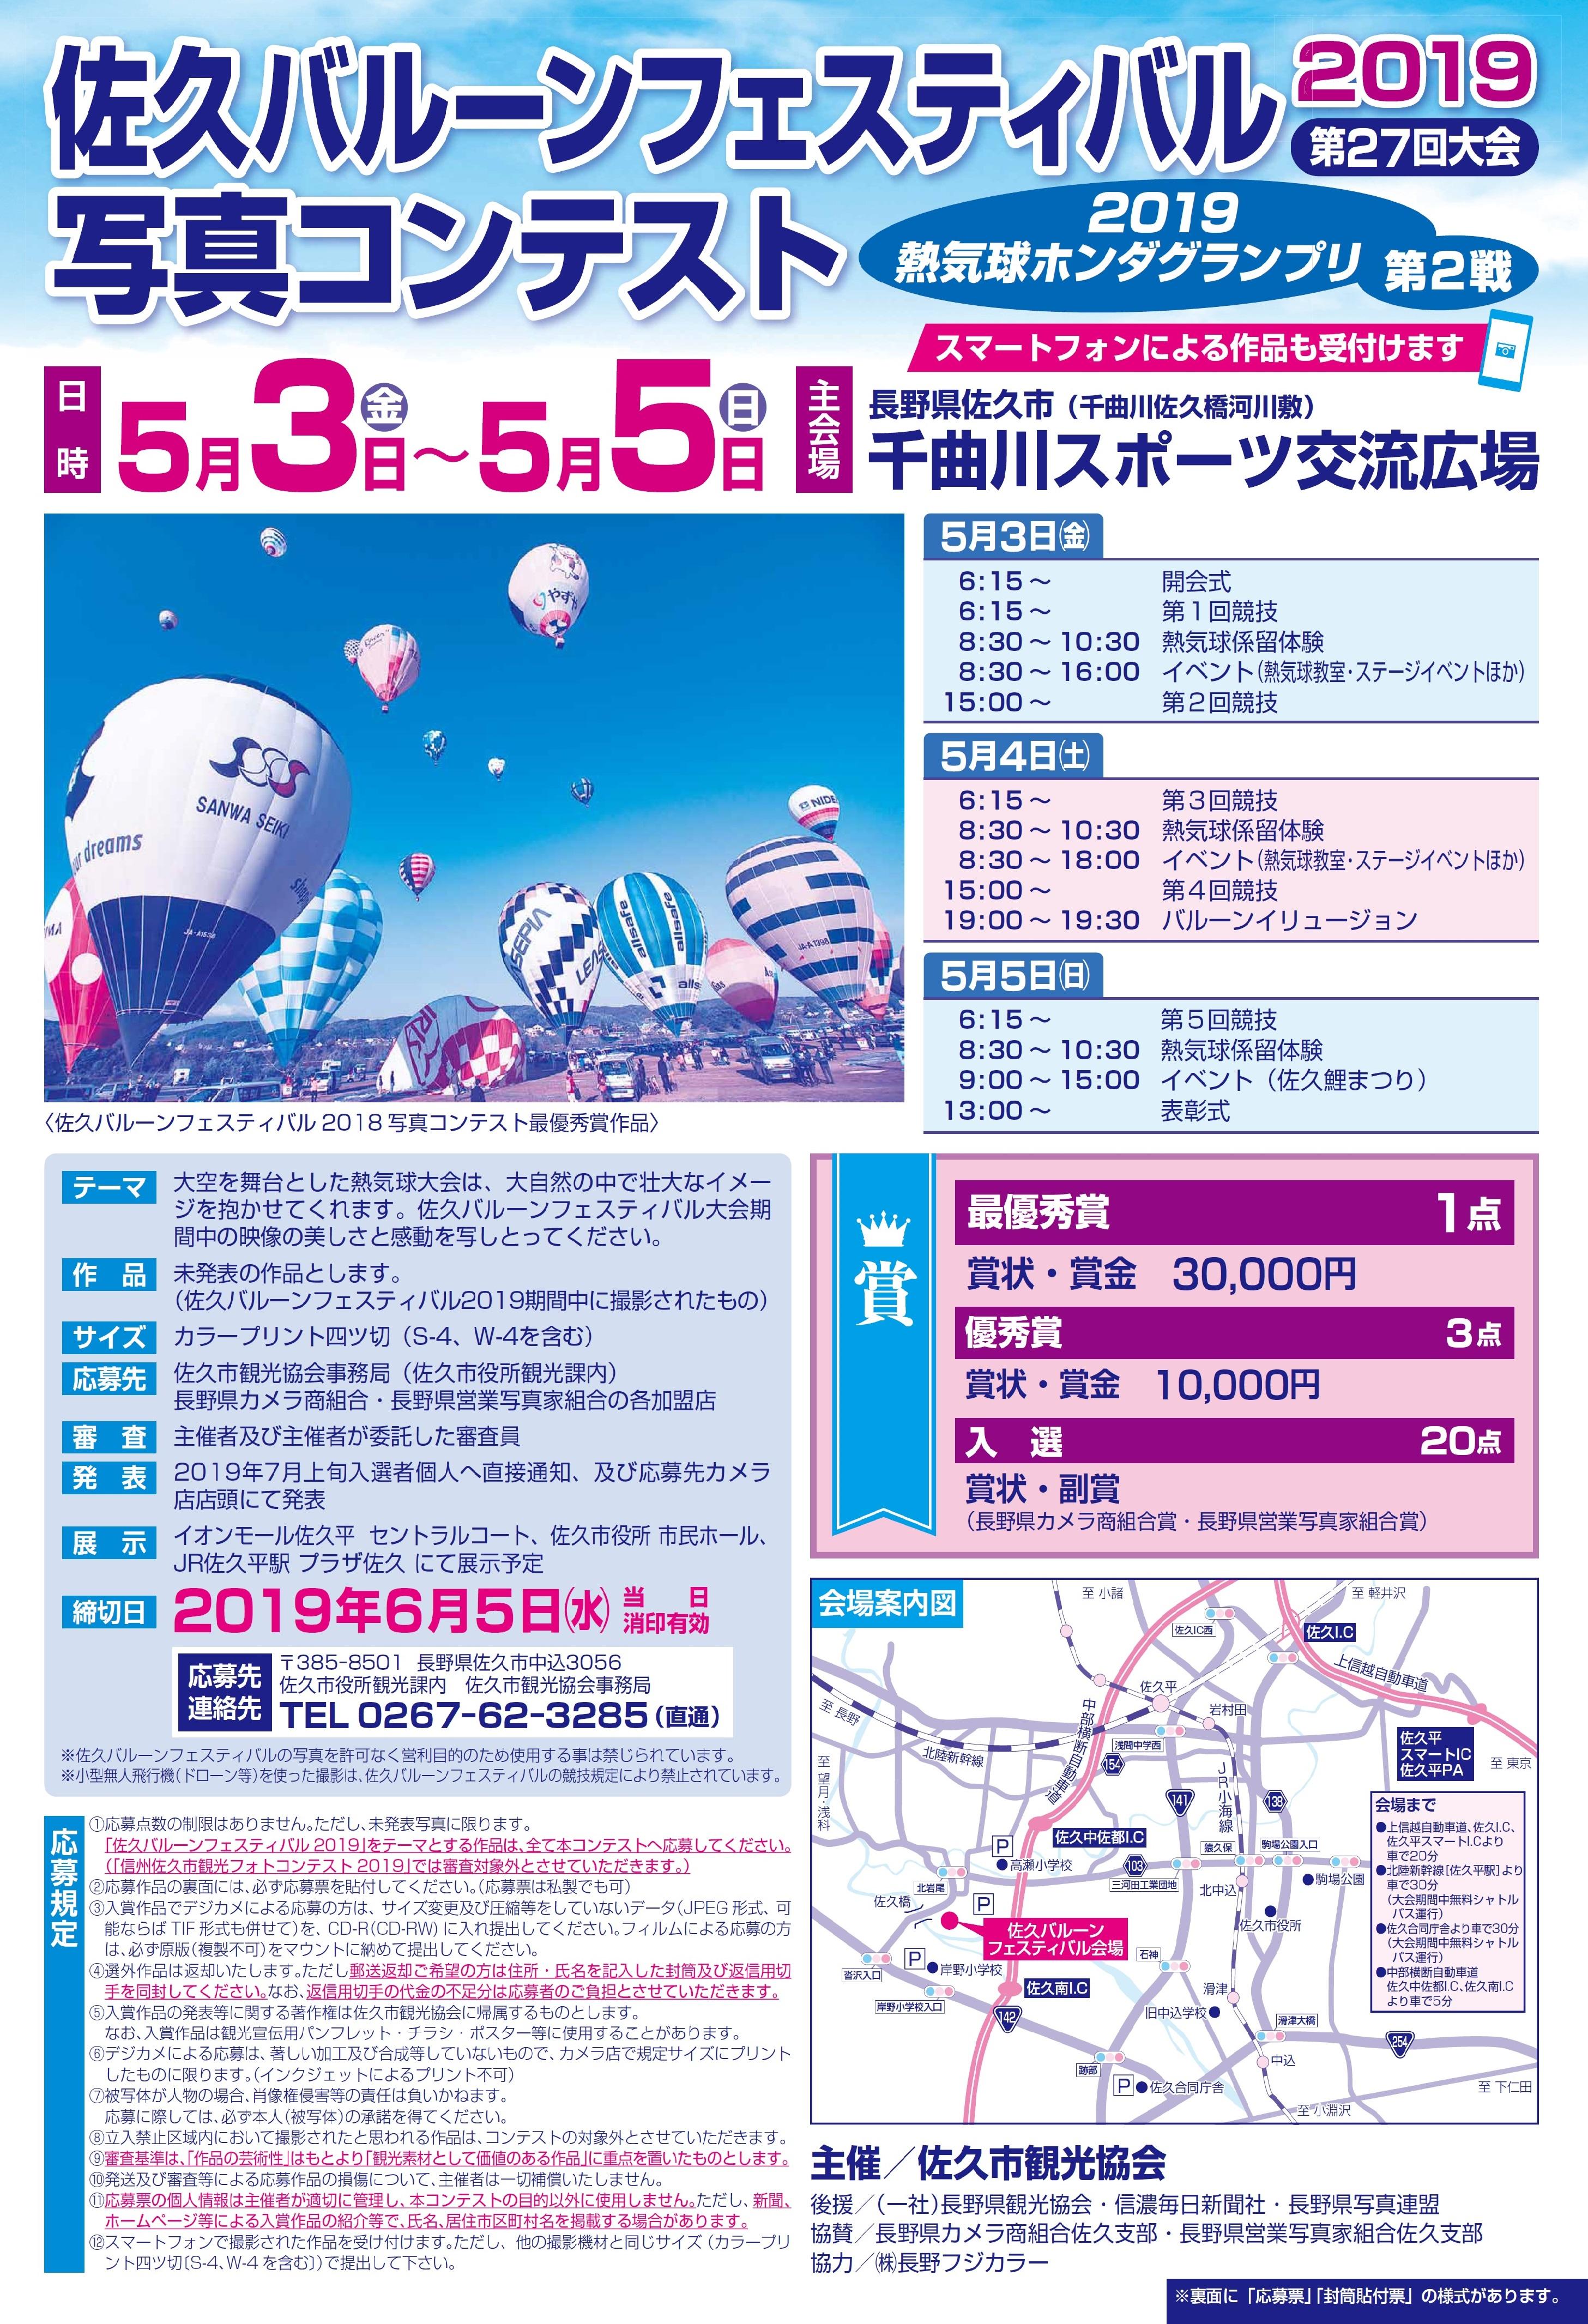 http://www.sakukankou.jp/photo-contest/%E3%83%81%E3%83%A9%E3%82%B7%E8%A1%A8.jpg